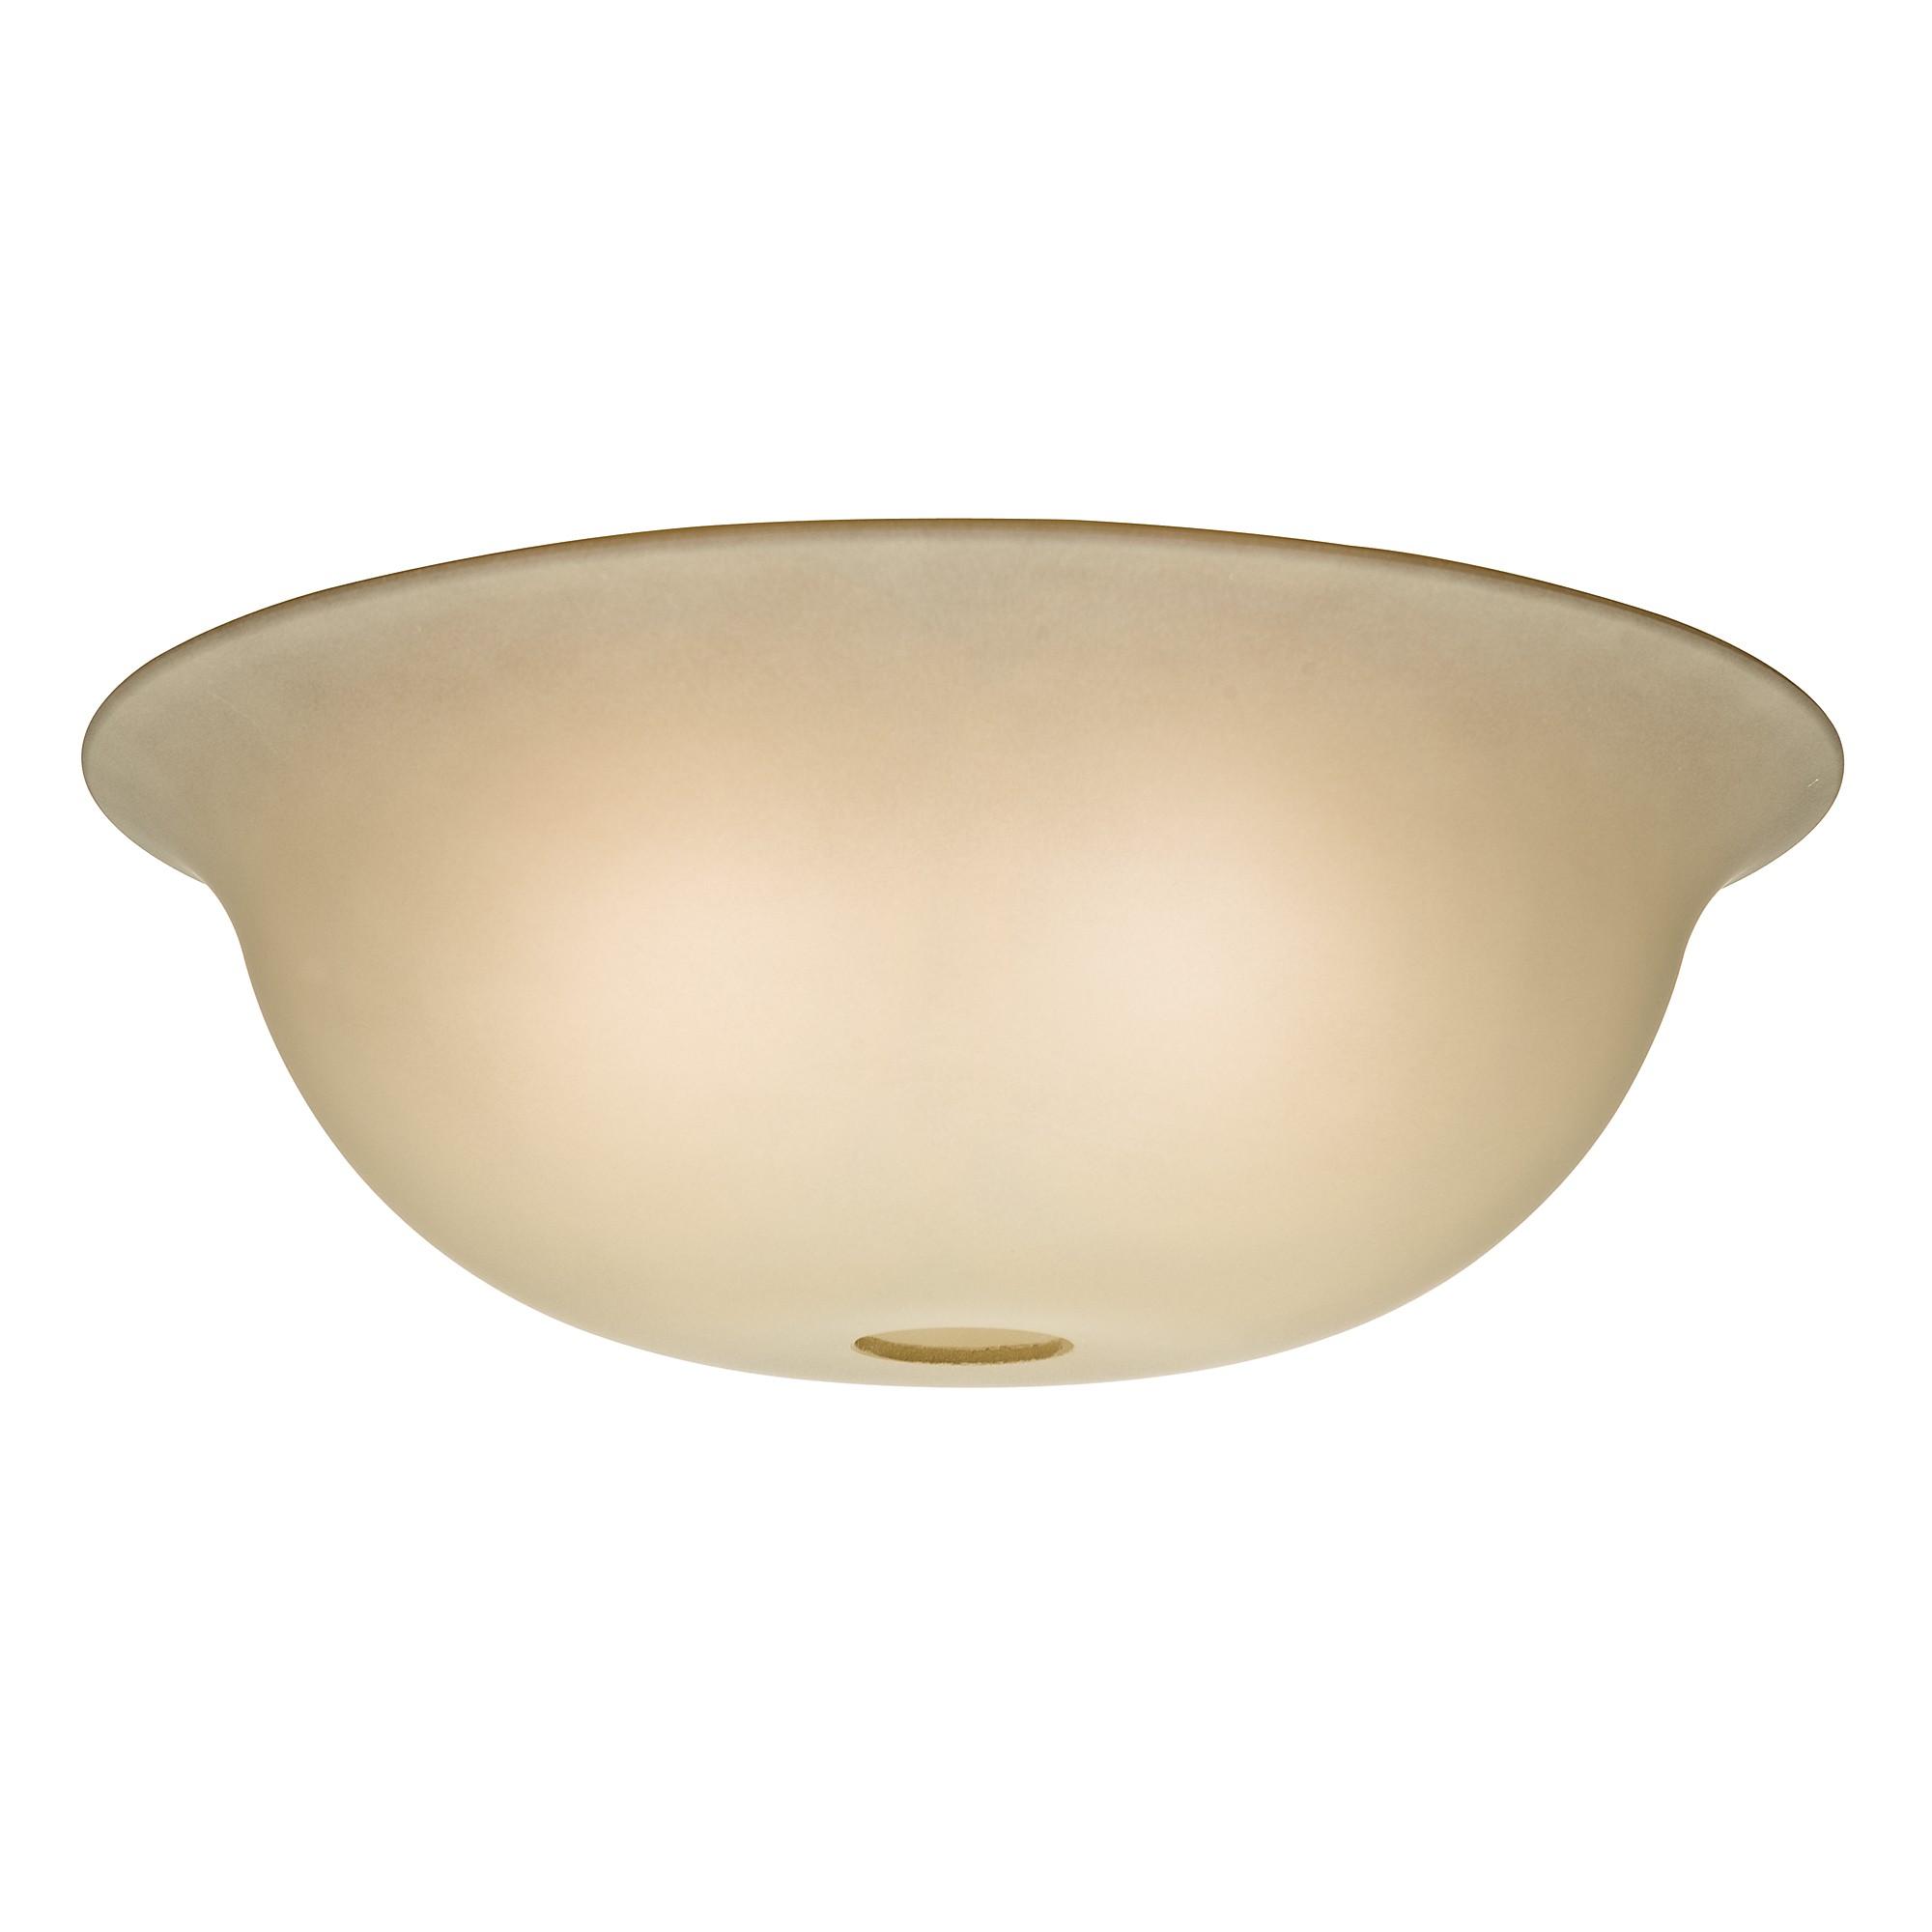 Tea Stain Glass Bowl